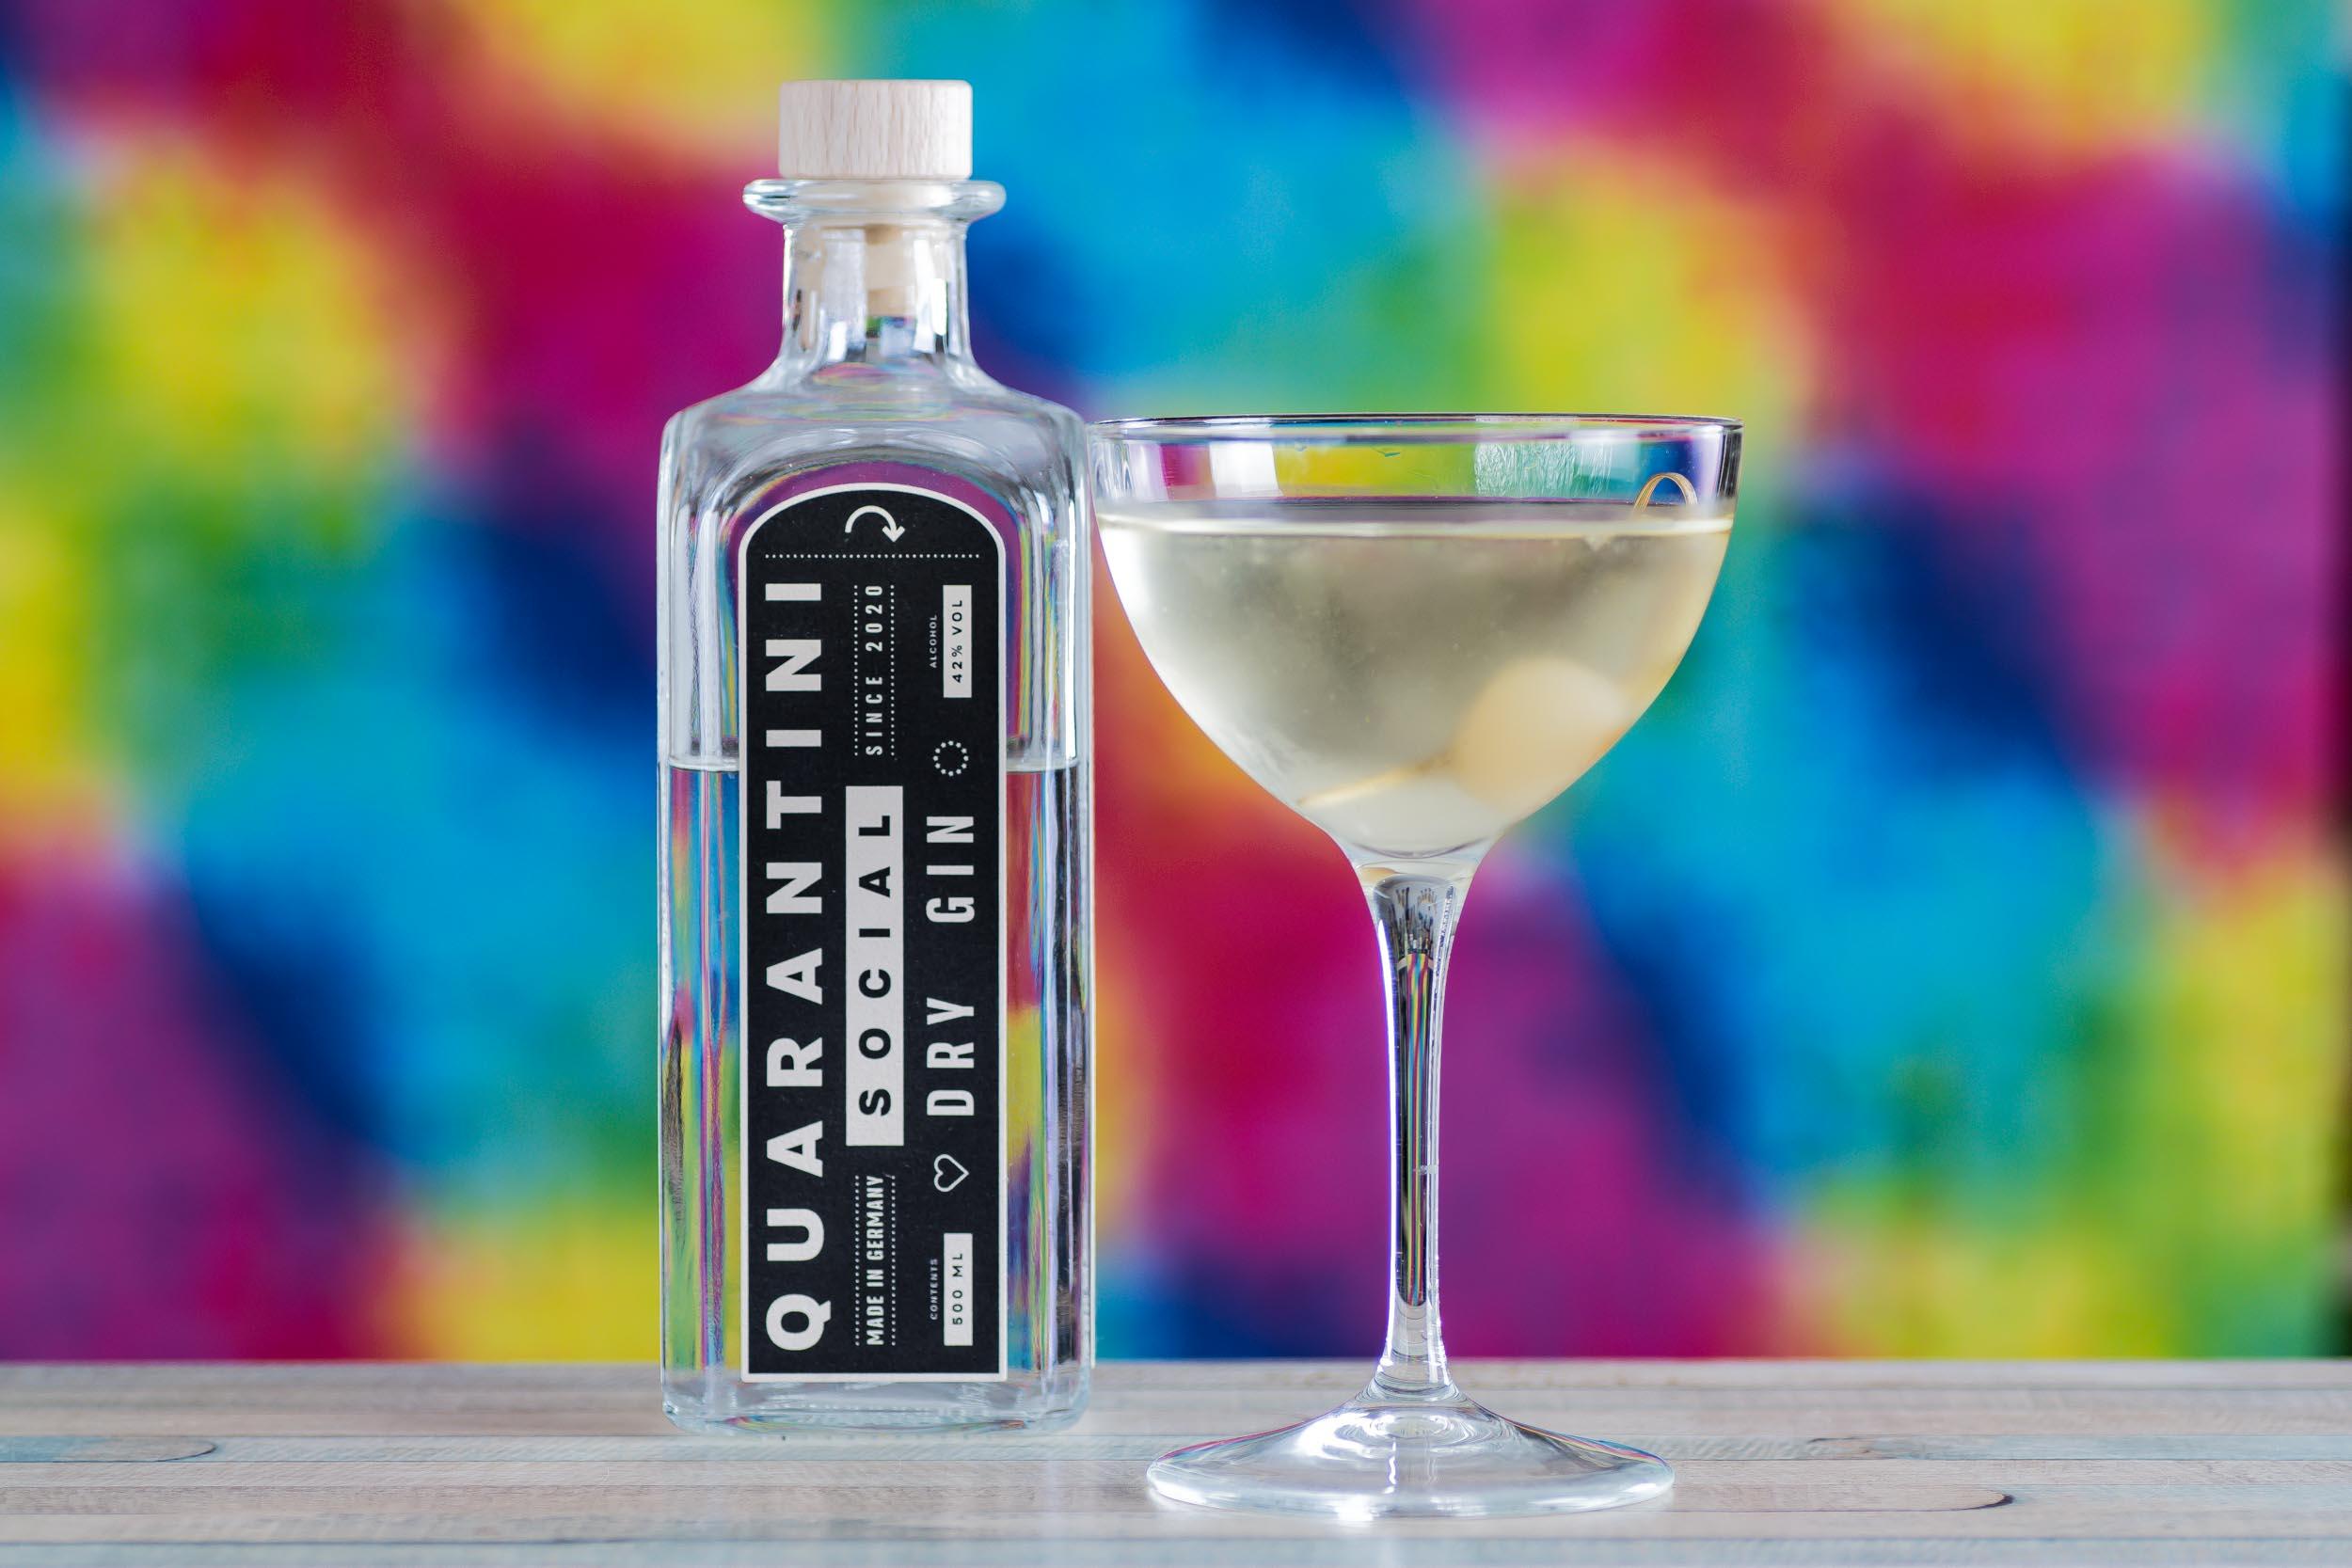 Ein Pandan Gibson Martini mit Quarantini Social Dry Gin.